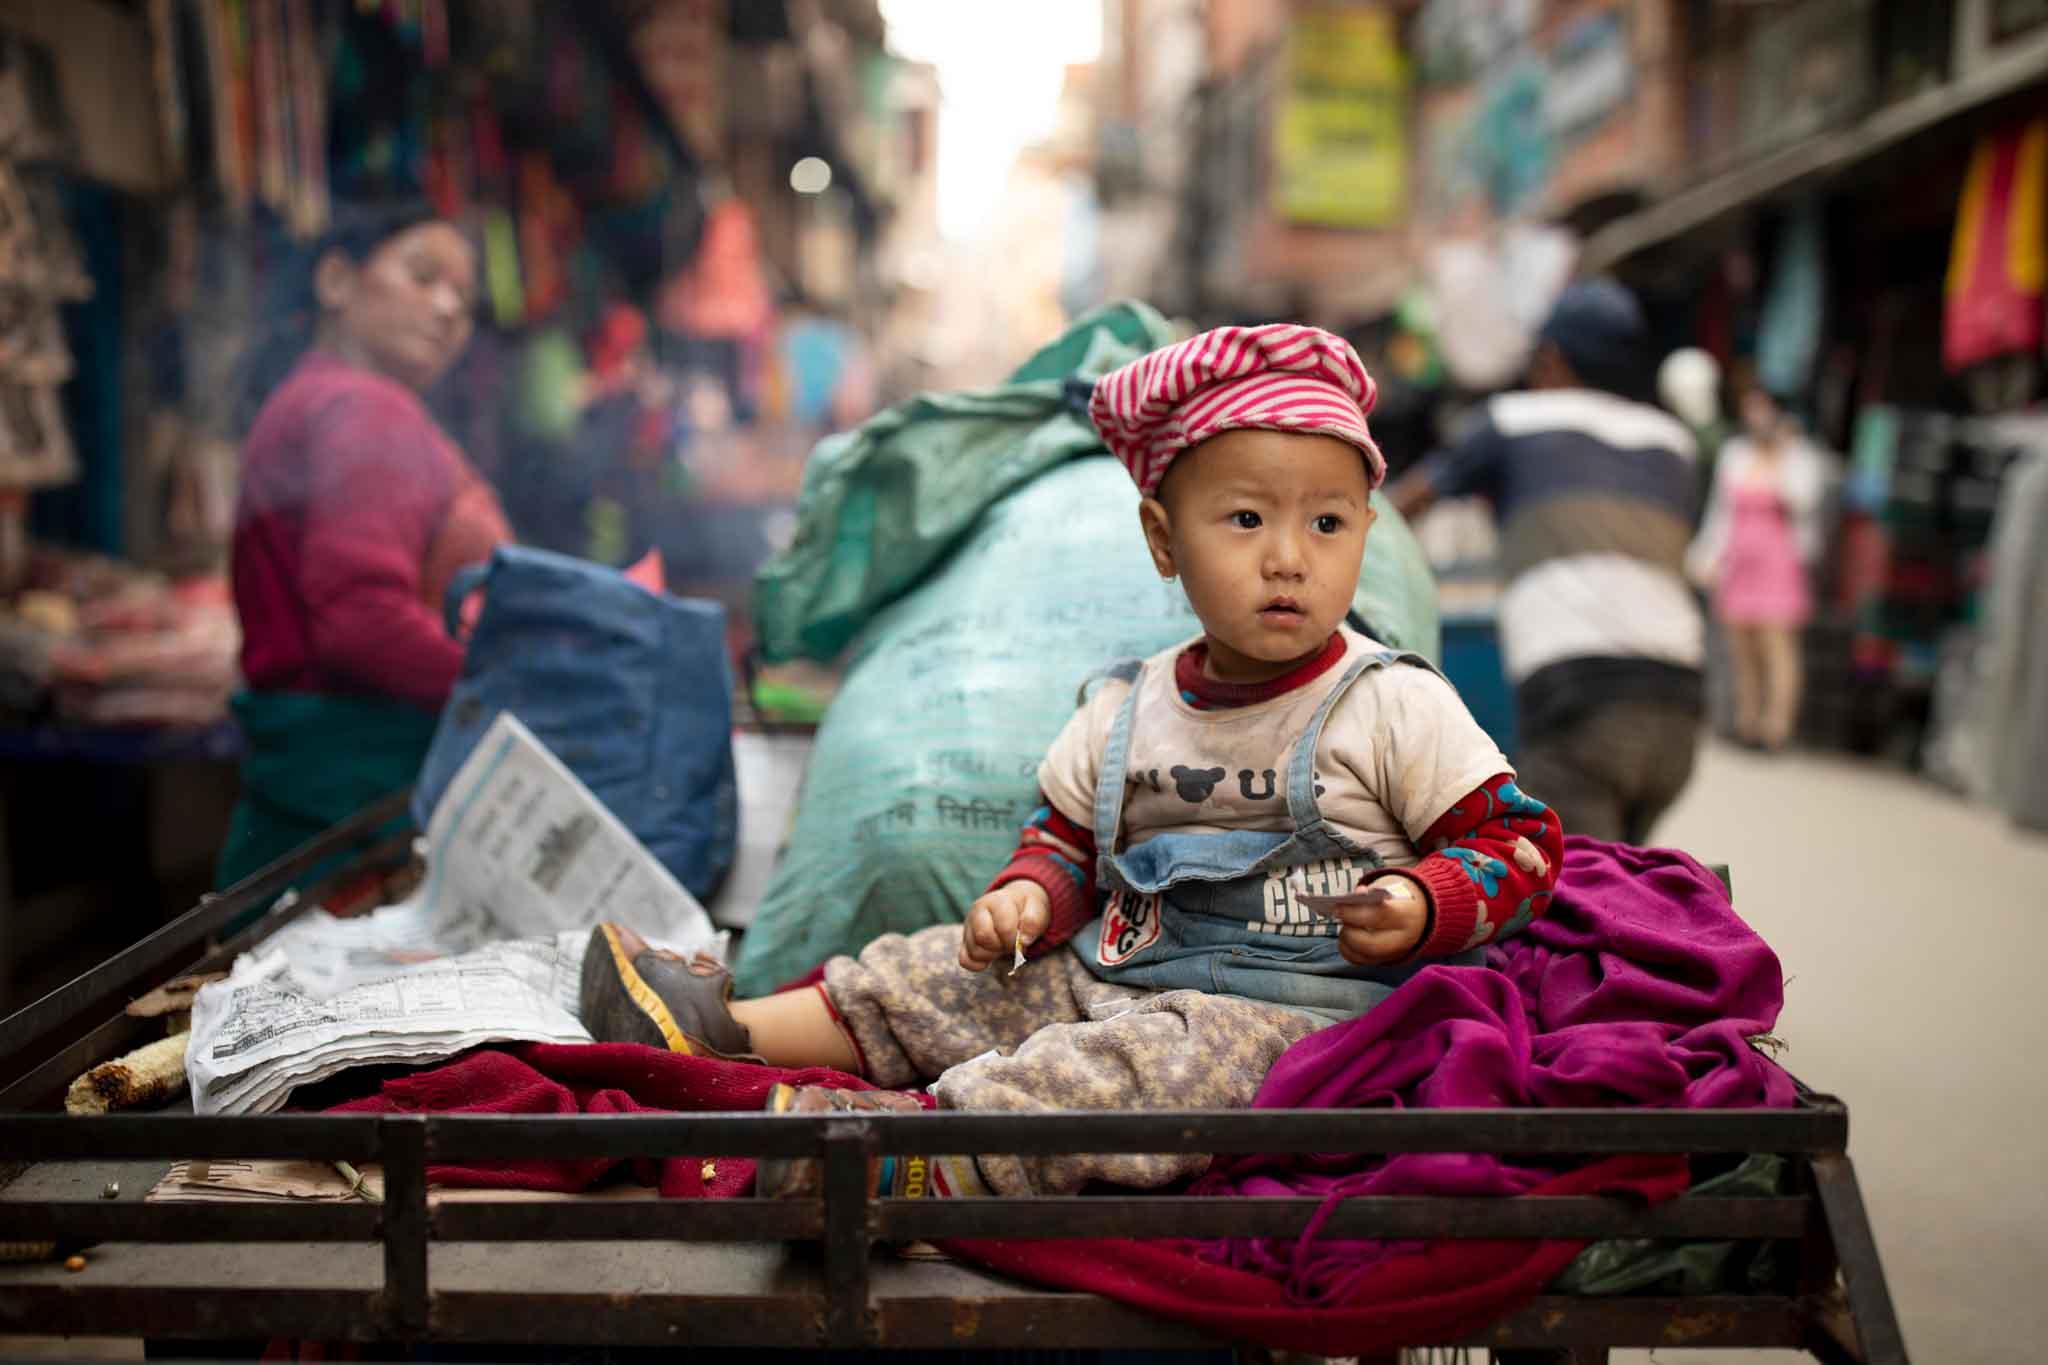 Travel ☼ Nepal ☼ Kathmandu